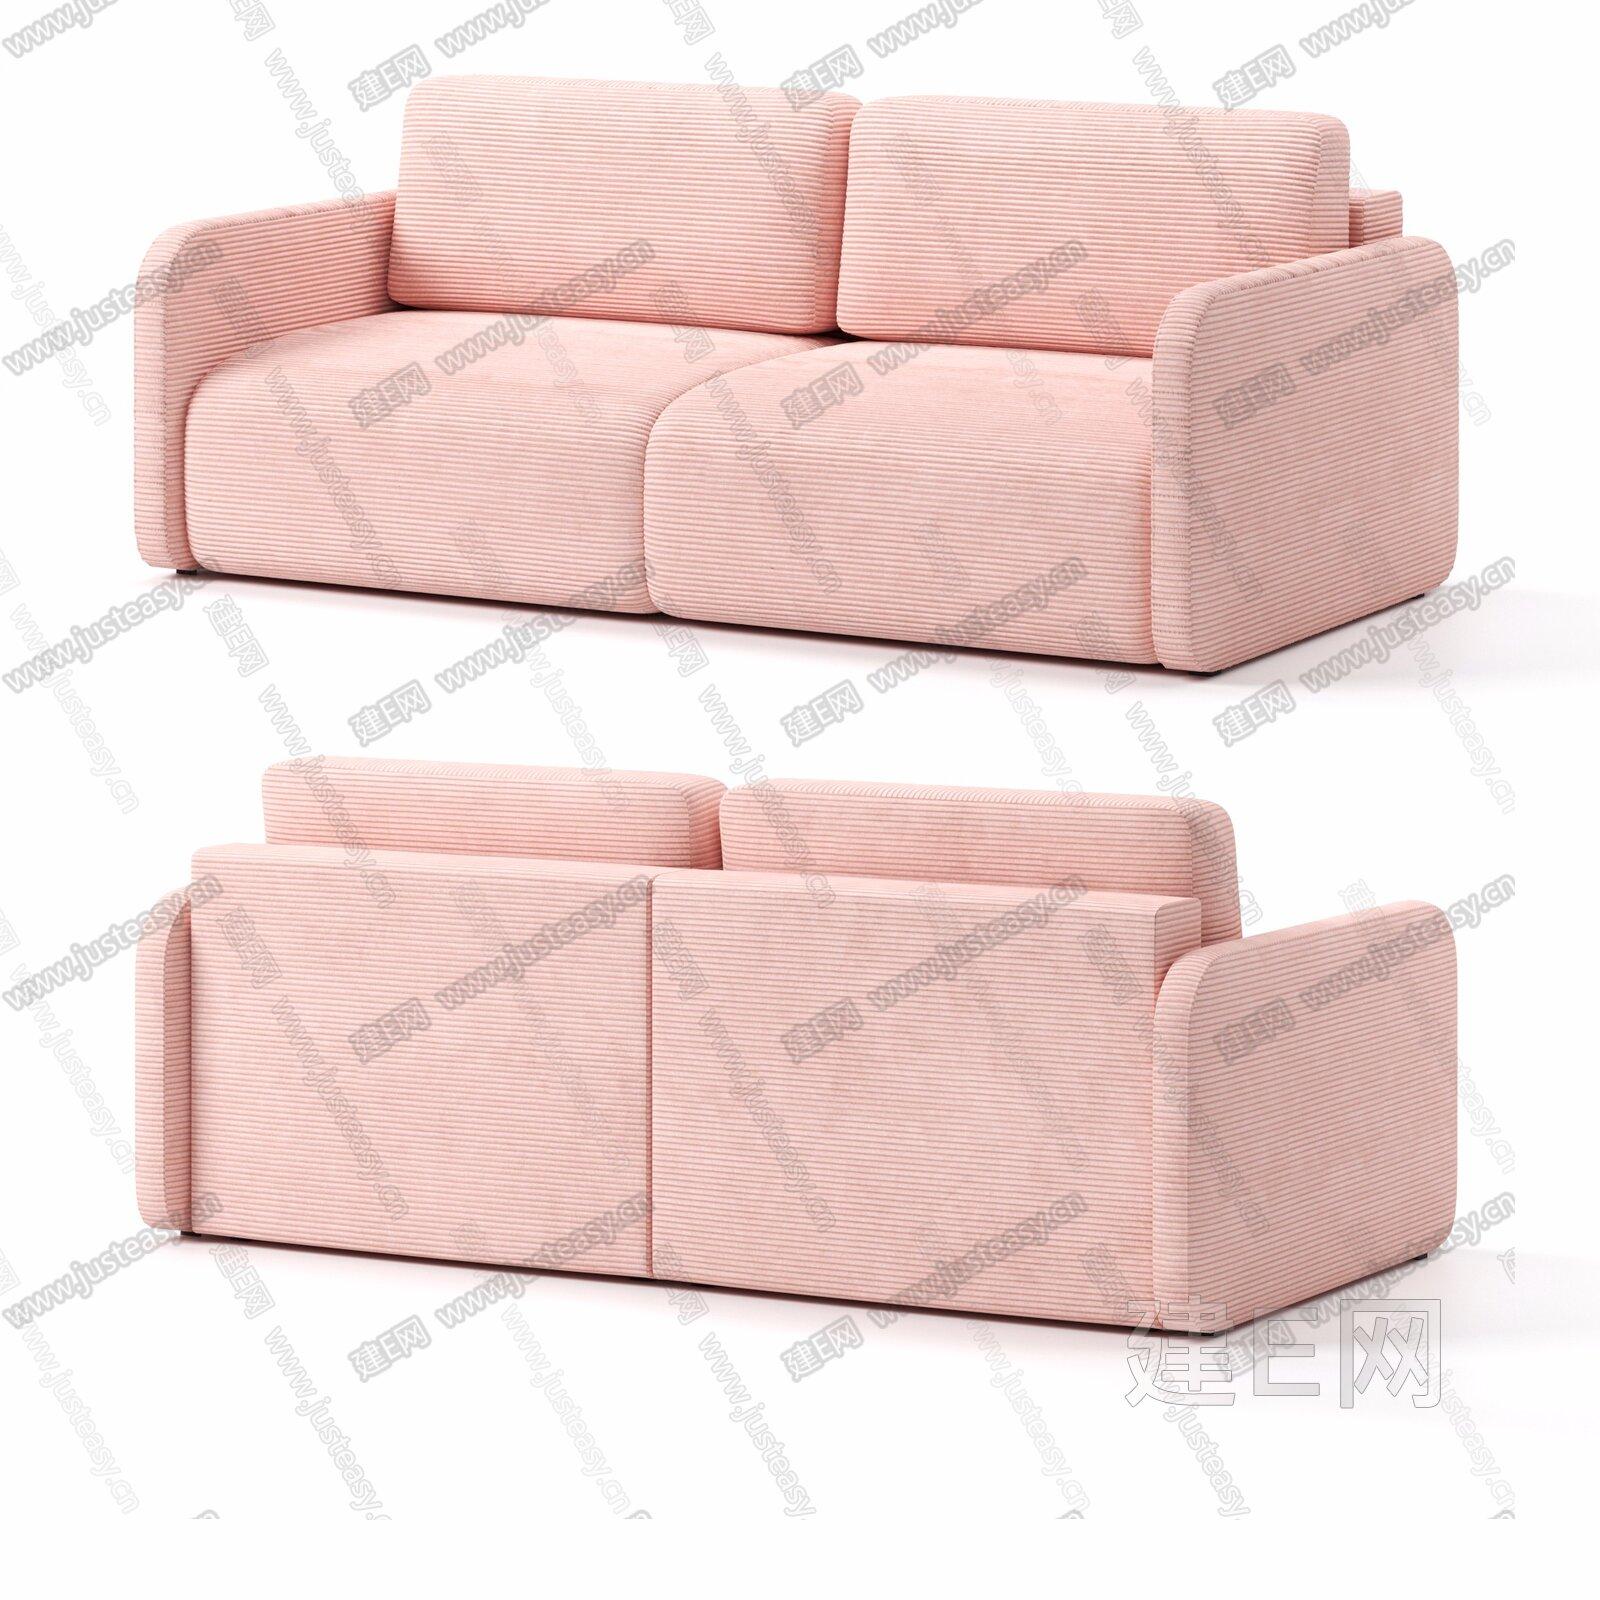 Home 现代沙发3d模型